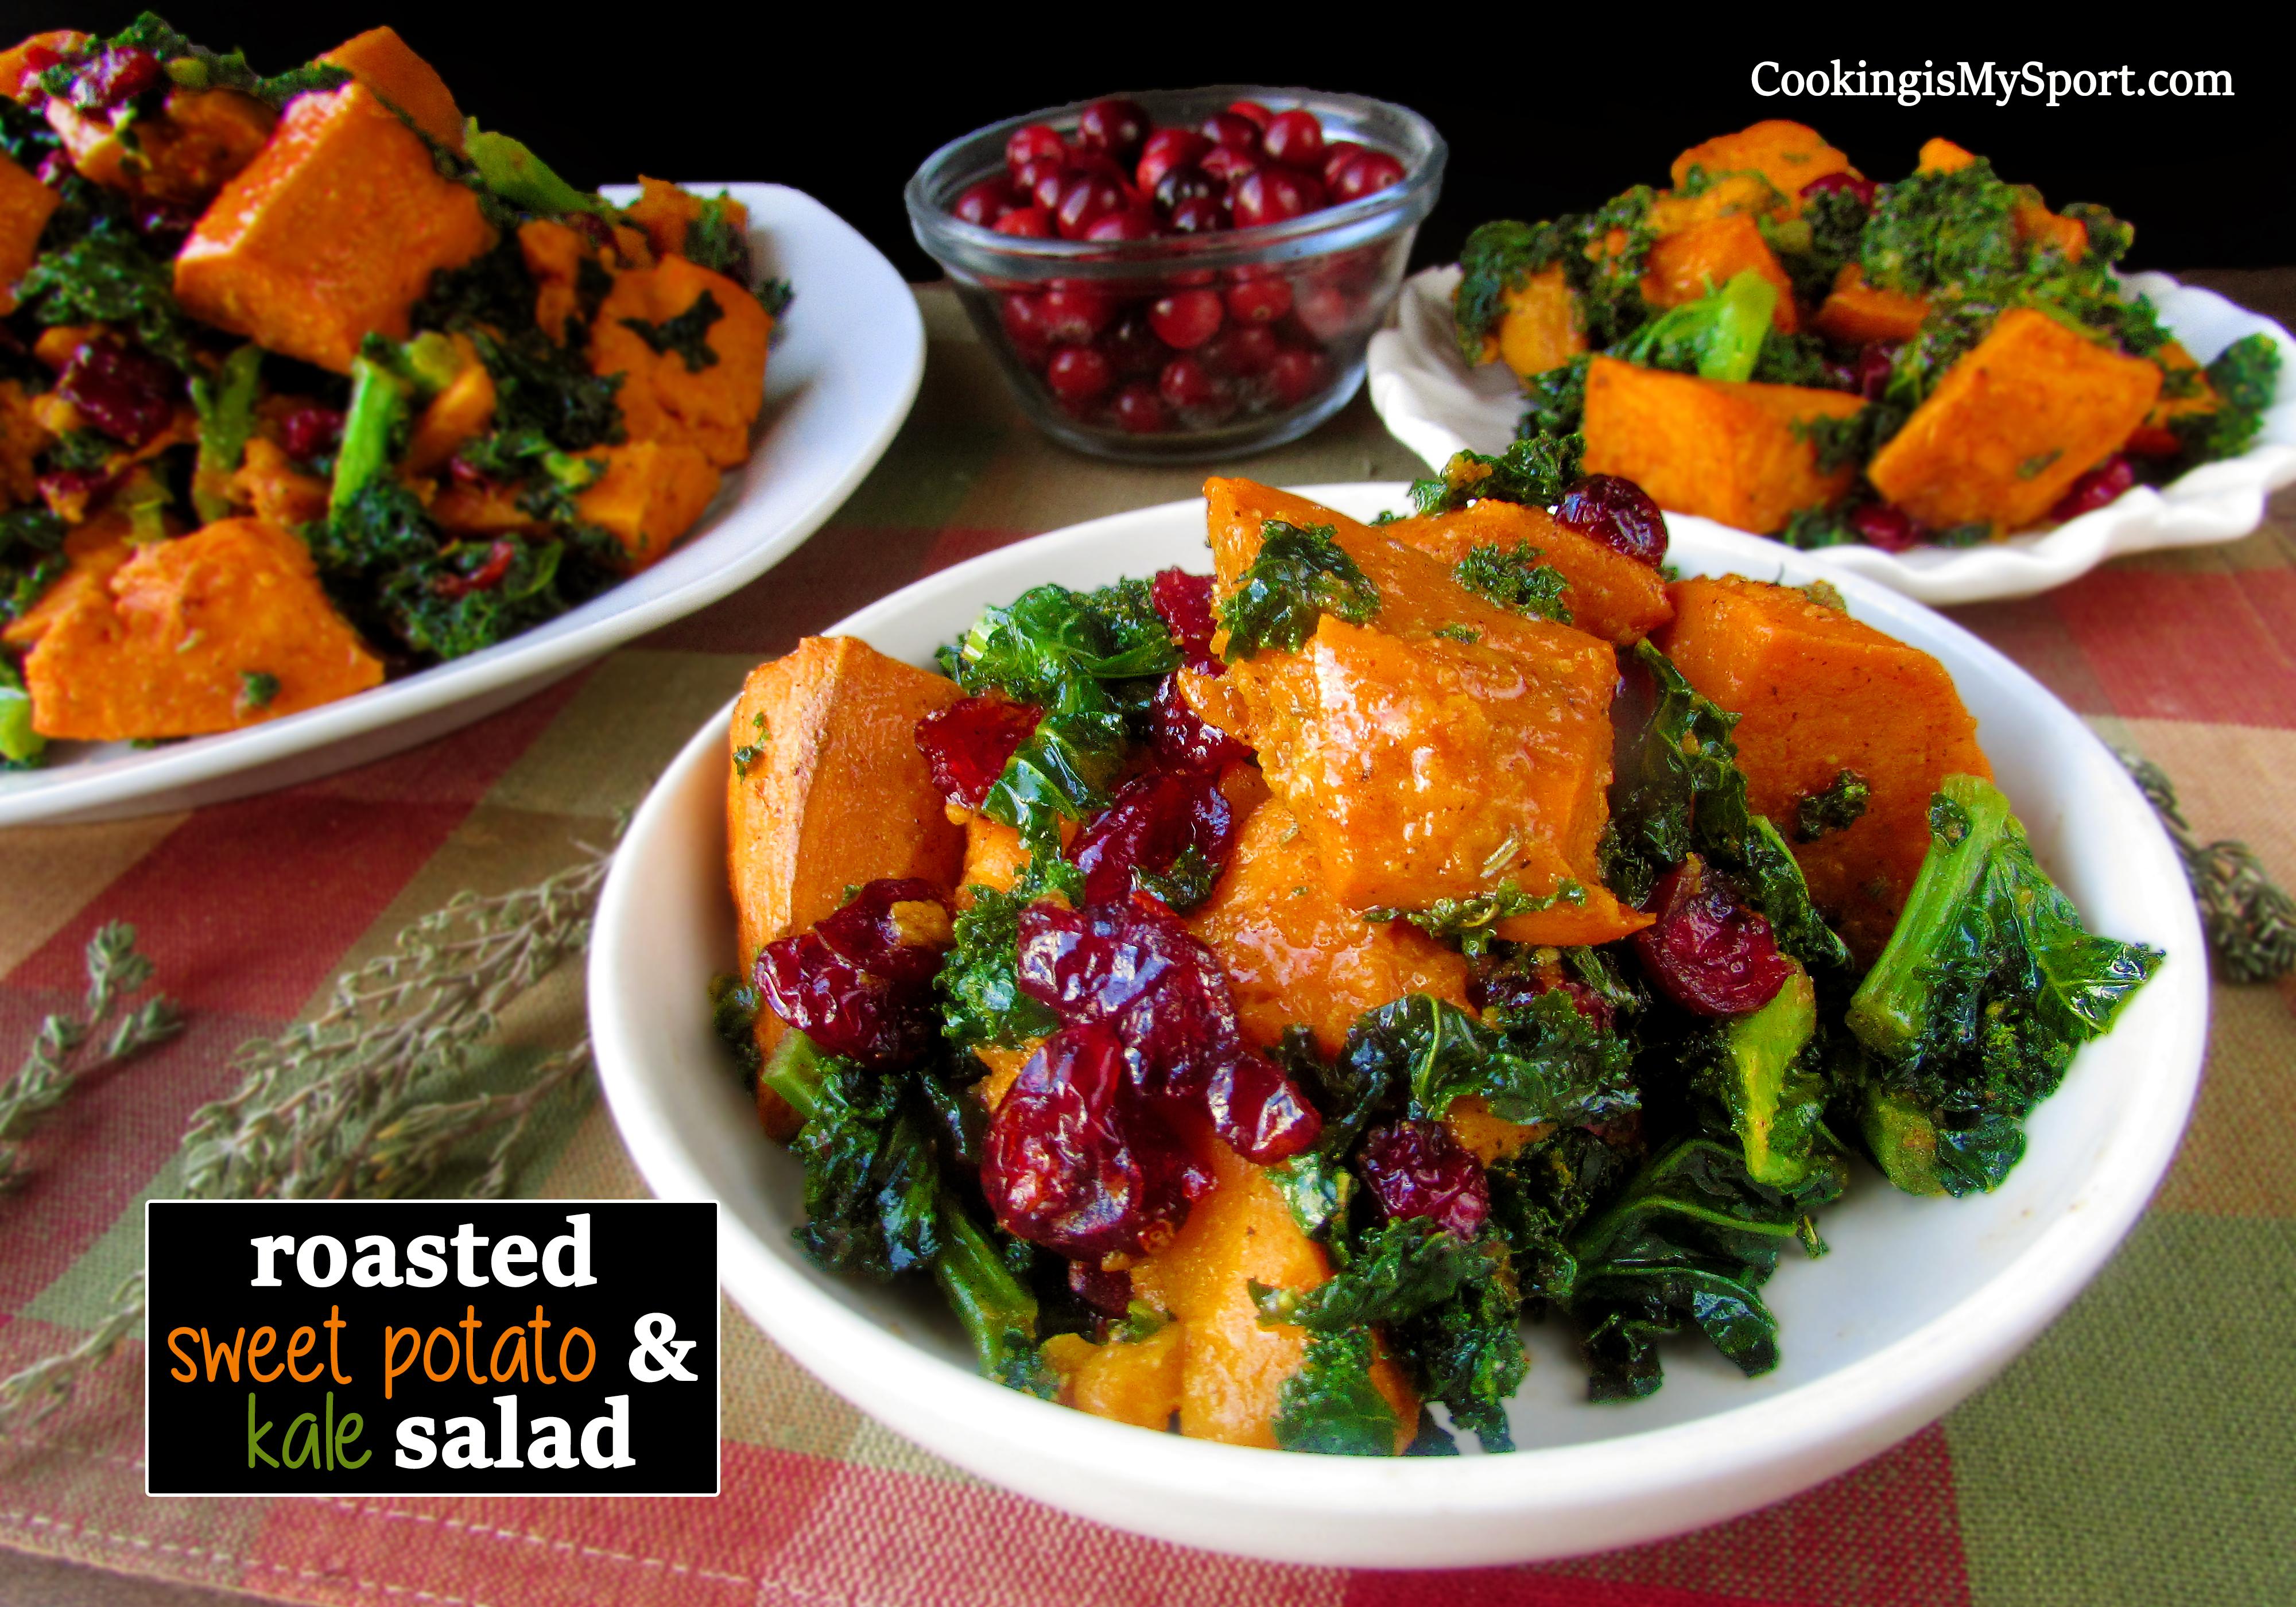 sweet-potato-kale-salad1